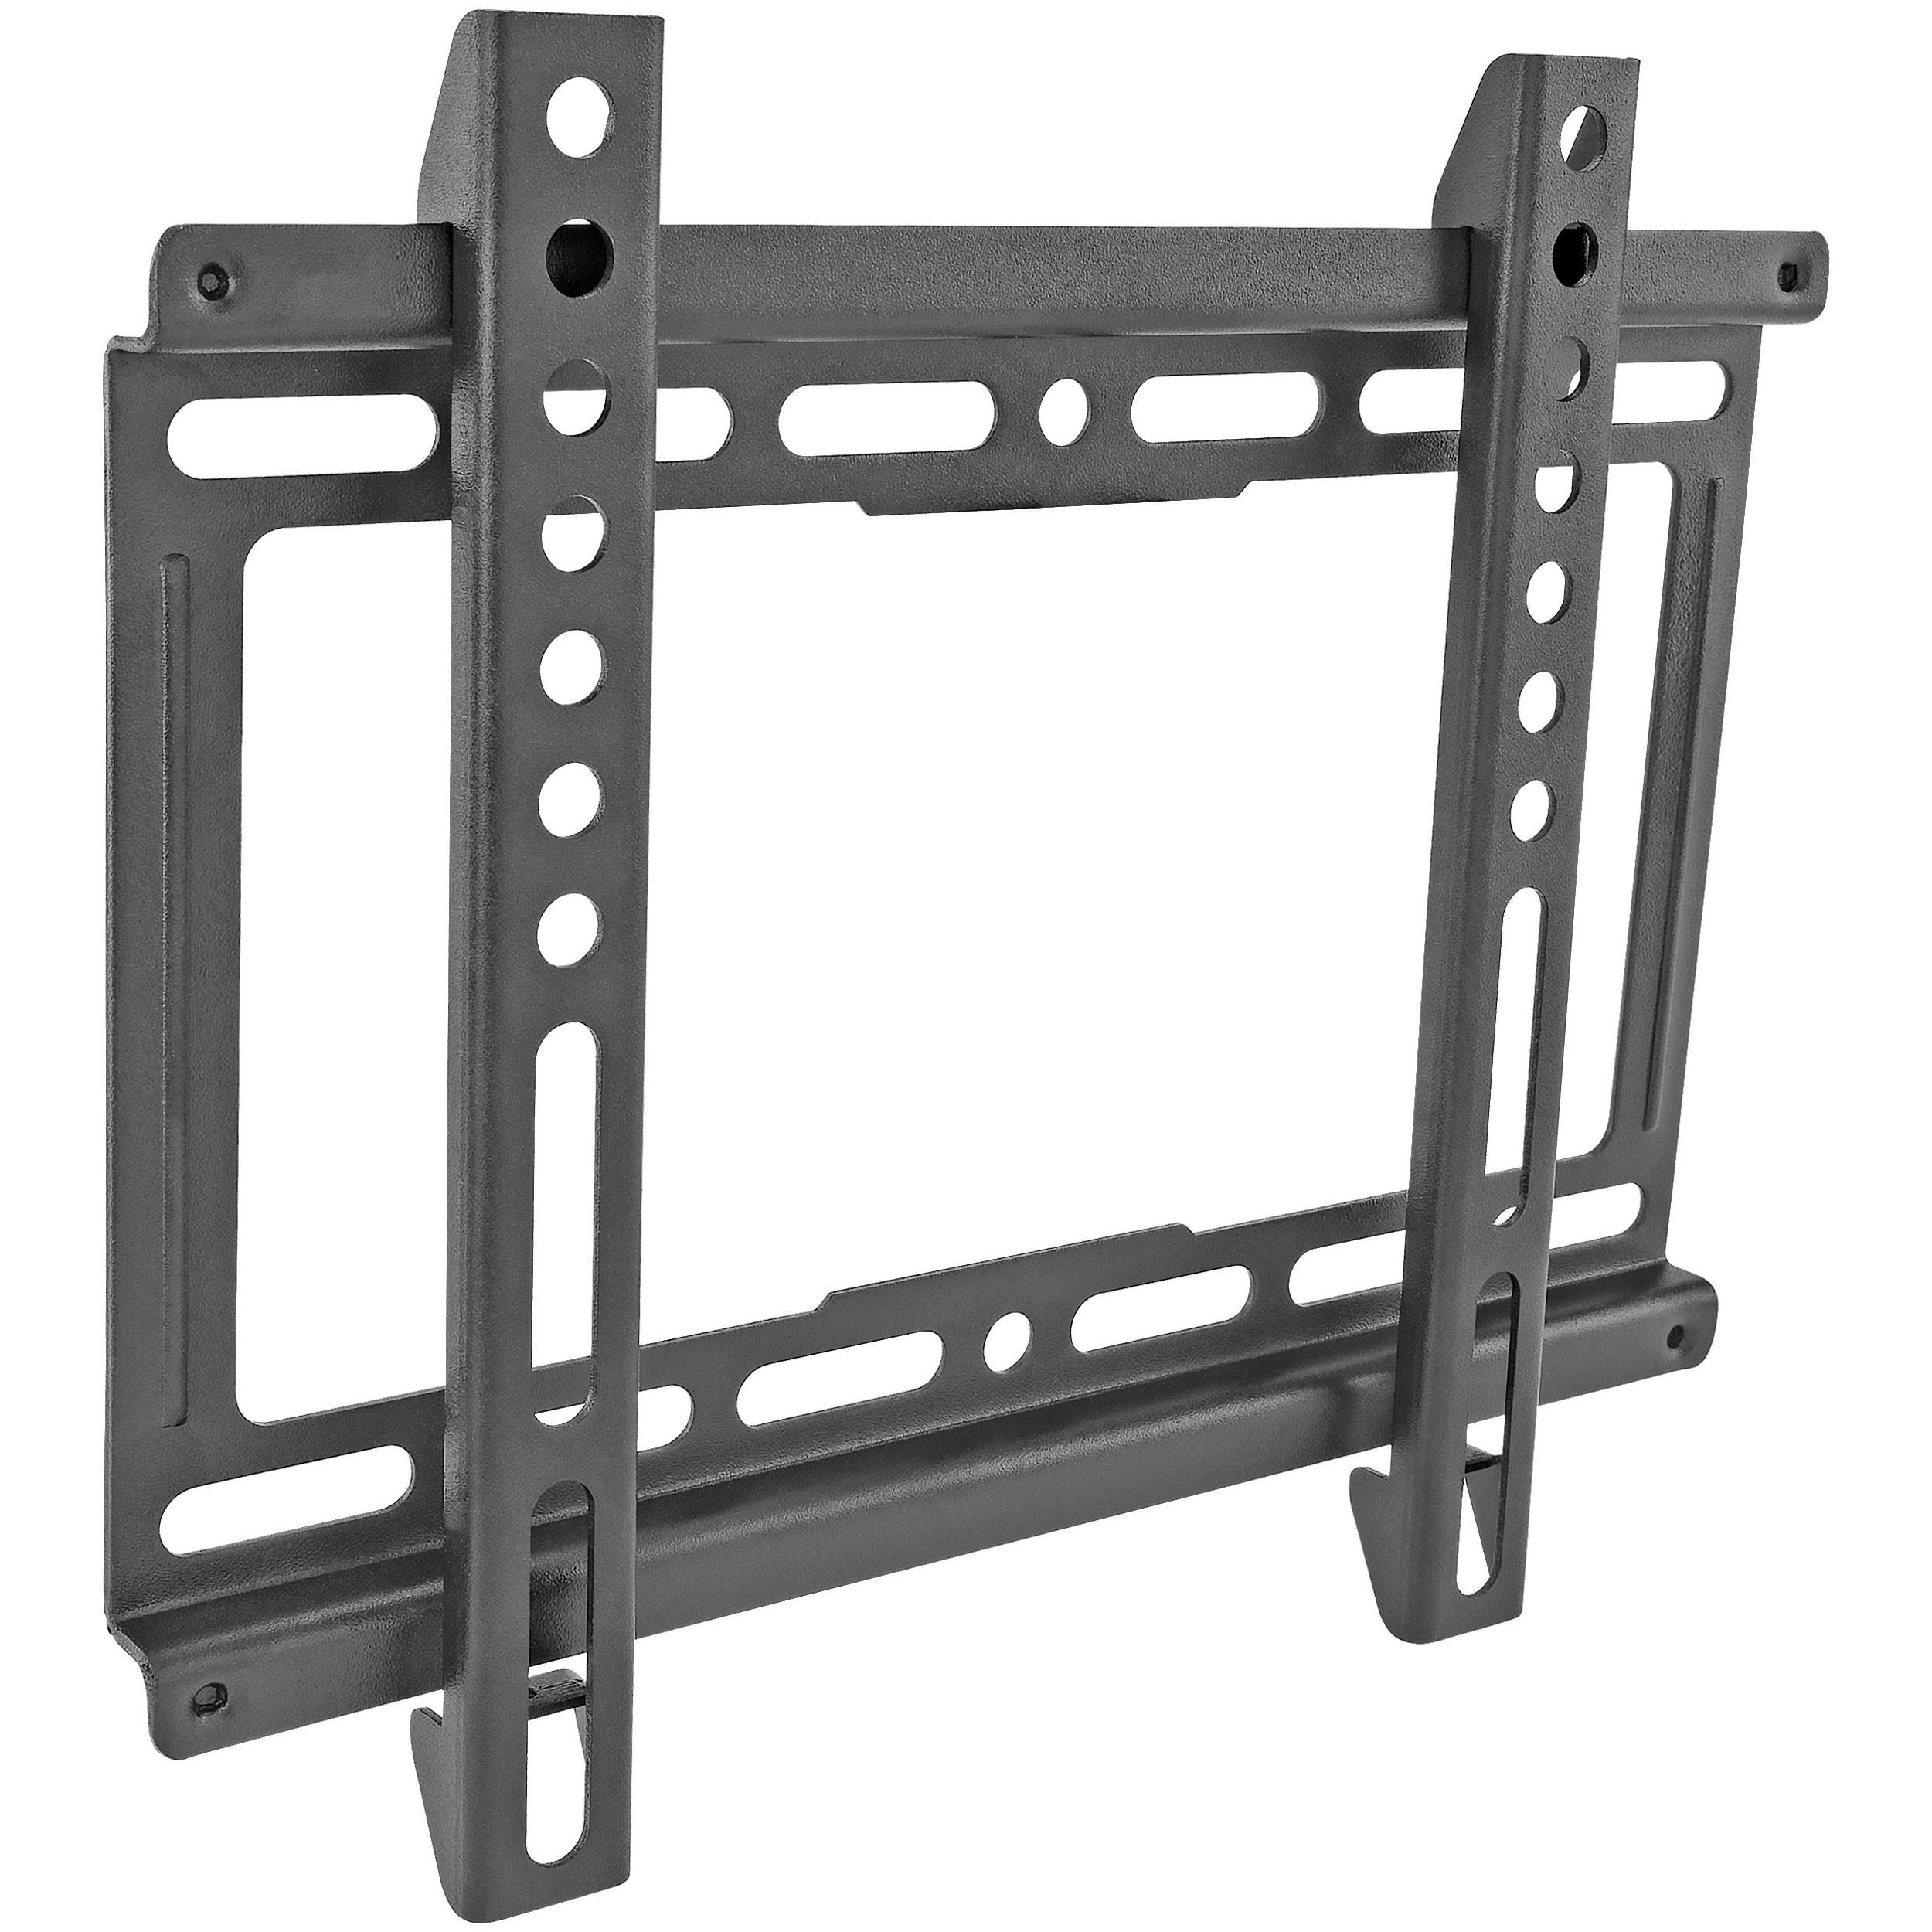 "Southern Homewares Ultra Slim TV Wall Mount Bracket 15"" up to 42"" Fits LED LCD Plasma"